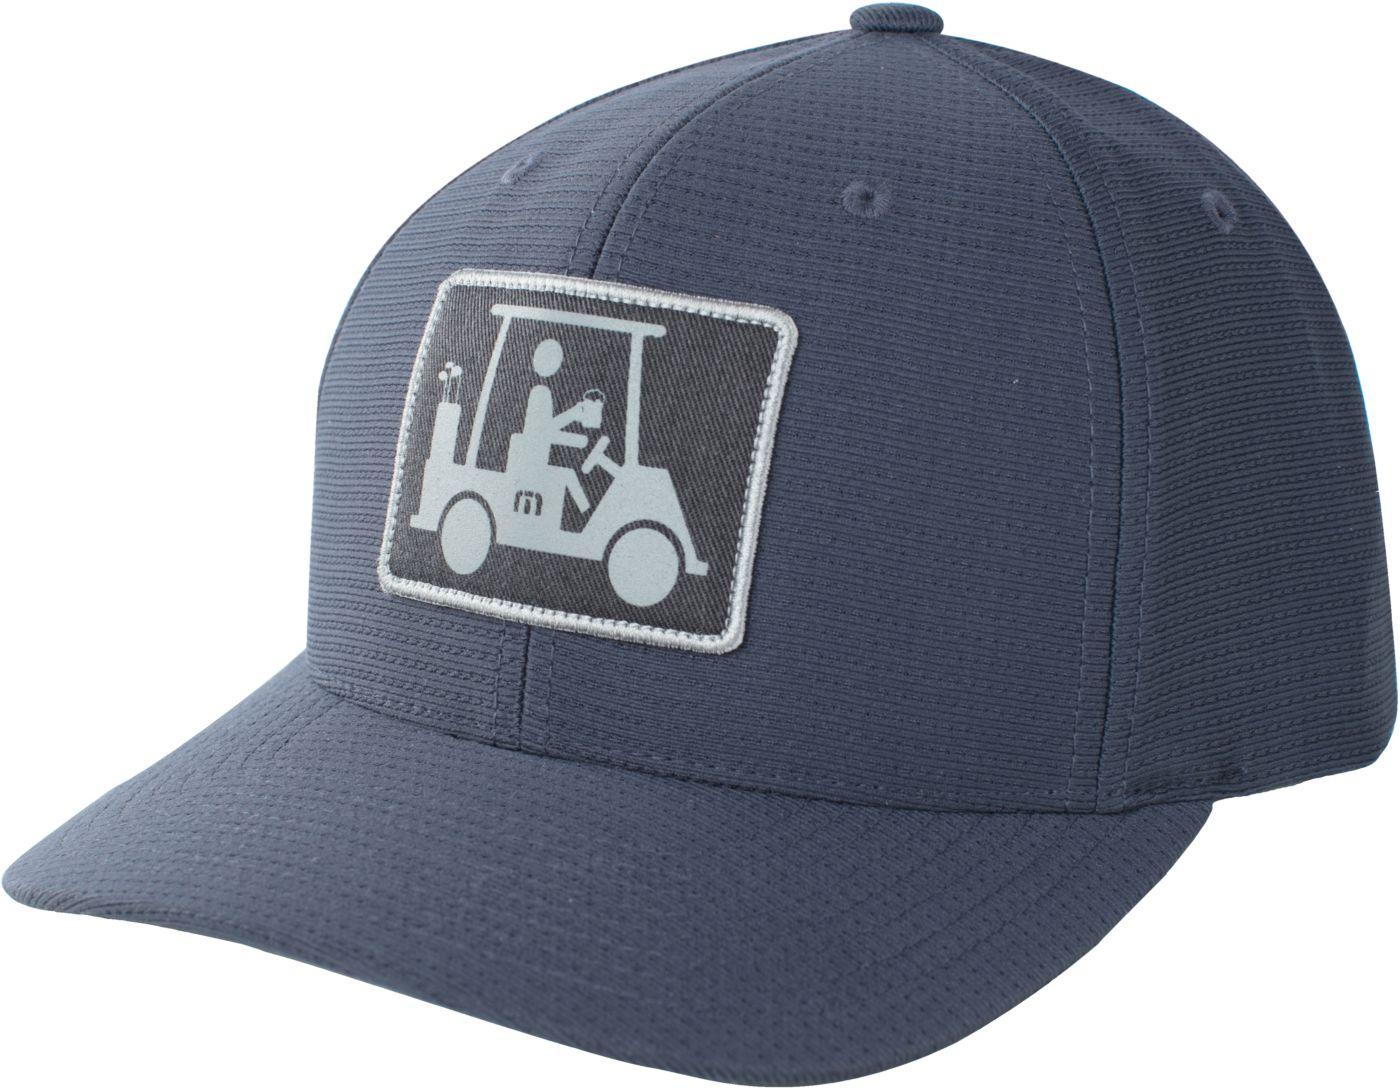 TravisMathew Coming In Hot Golf Hat